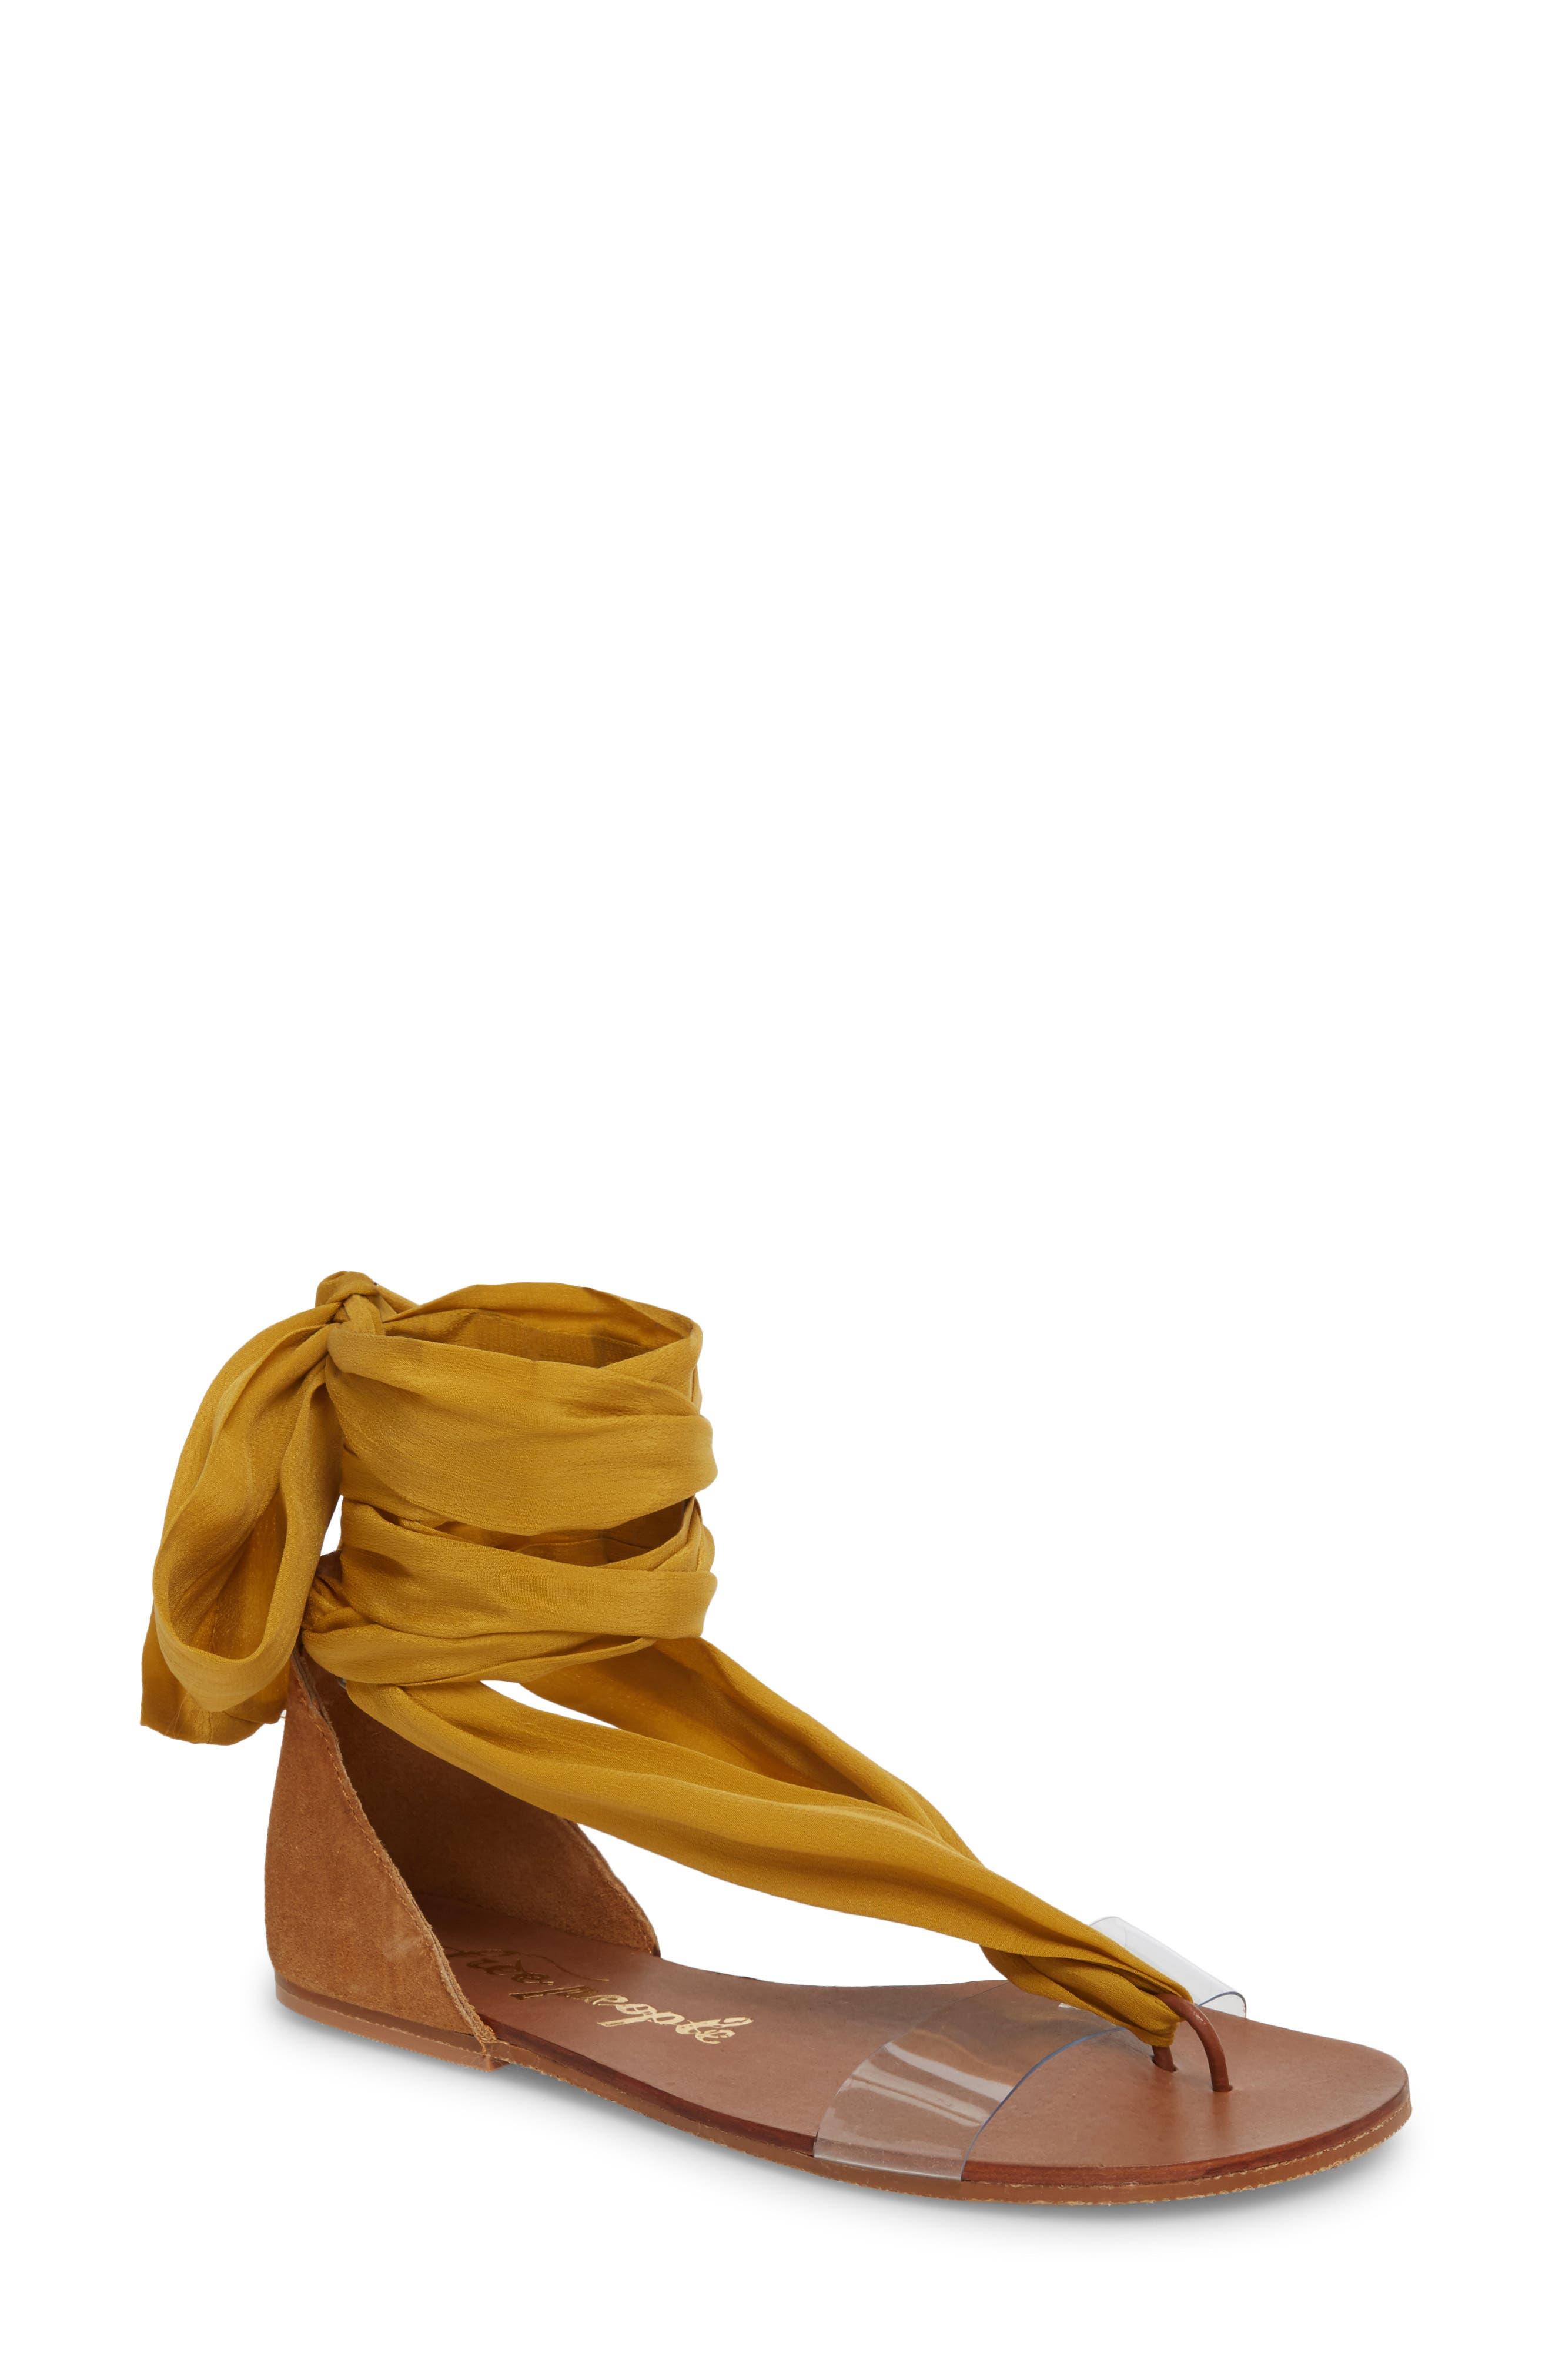 Alternate Image 1 Selected - Free People Barcelona Wrap Sandal (Women)